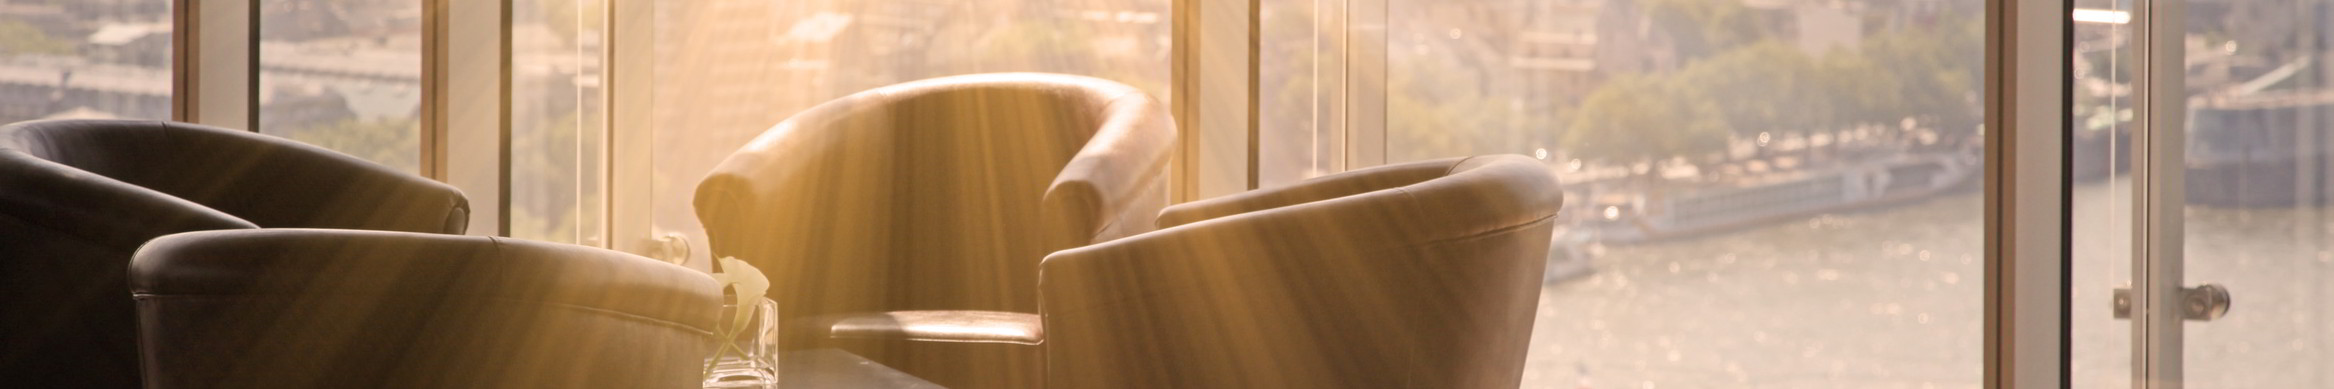 wie funktioniert creditreform ceg eigenauskunft beantragen. Black Bedroom Furniture Sets. Home Design Ideas